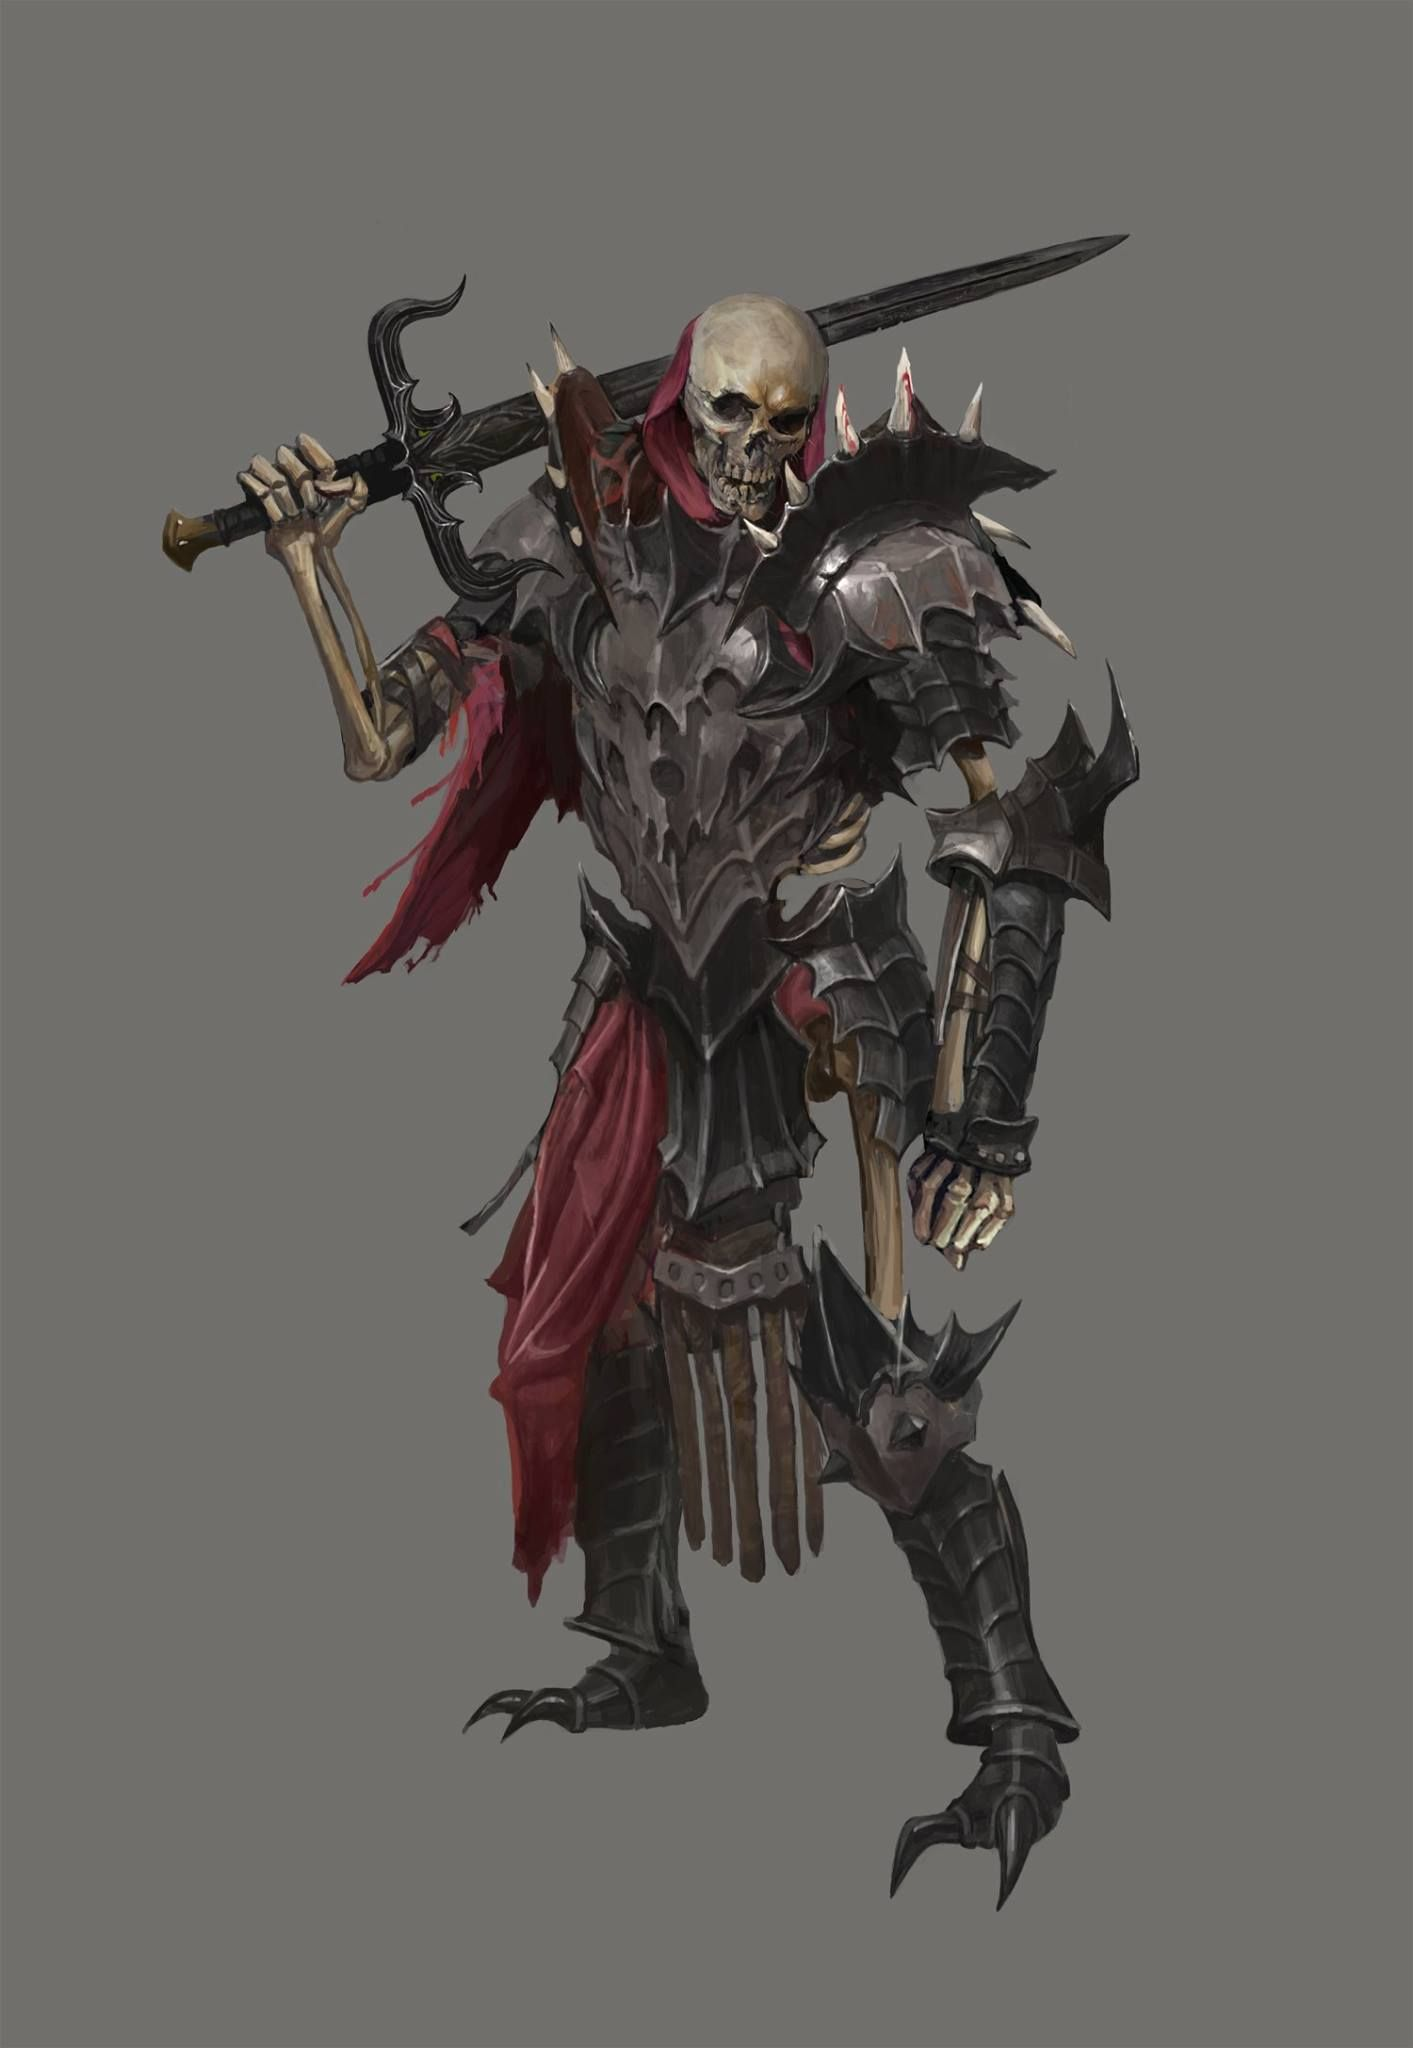 Pin by DarkoK on Fantasy Concept Art   Skeleton warrior ...